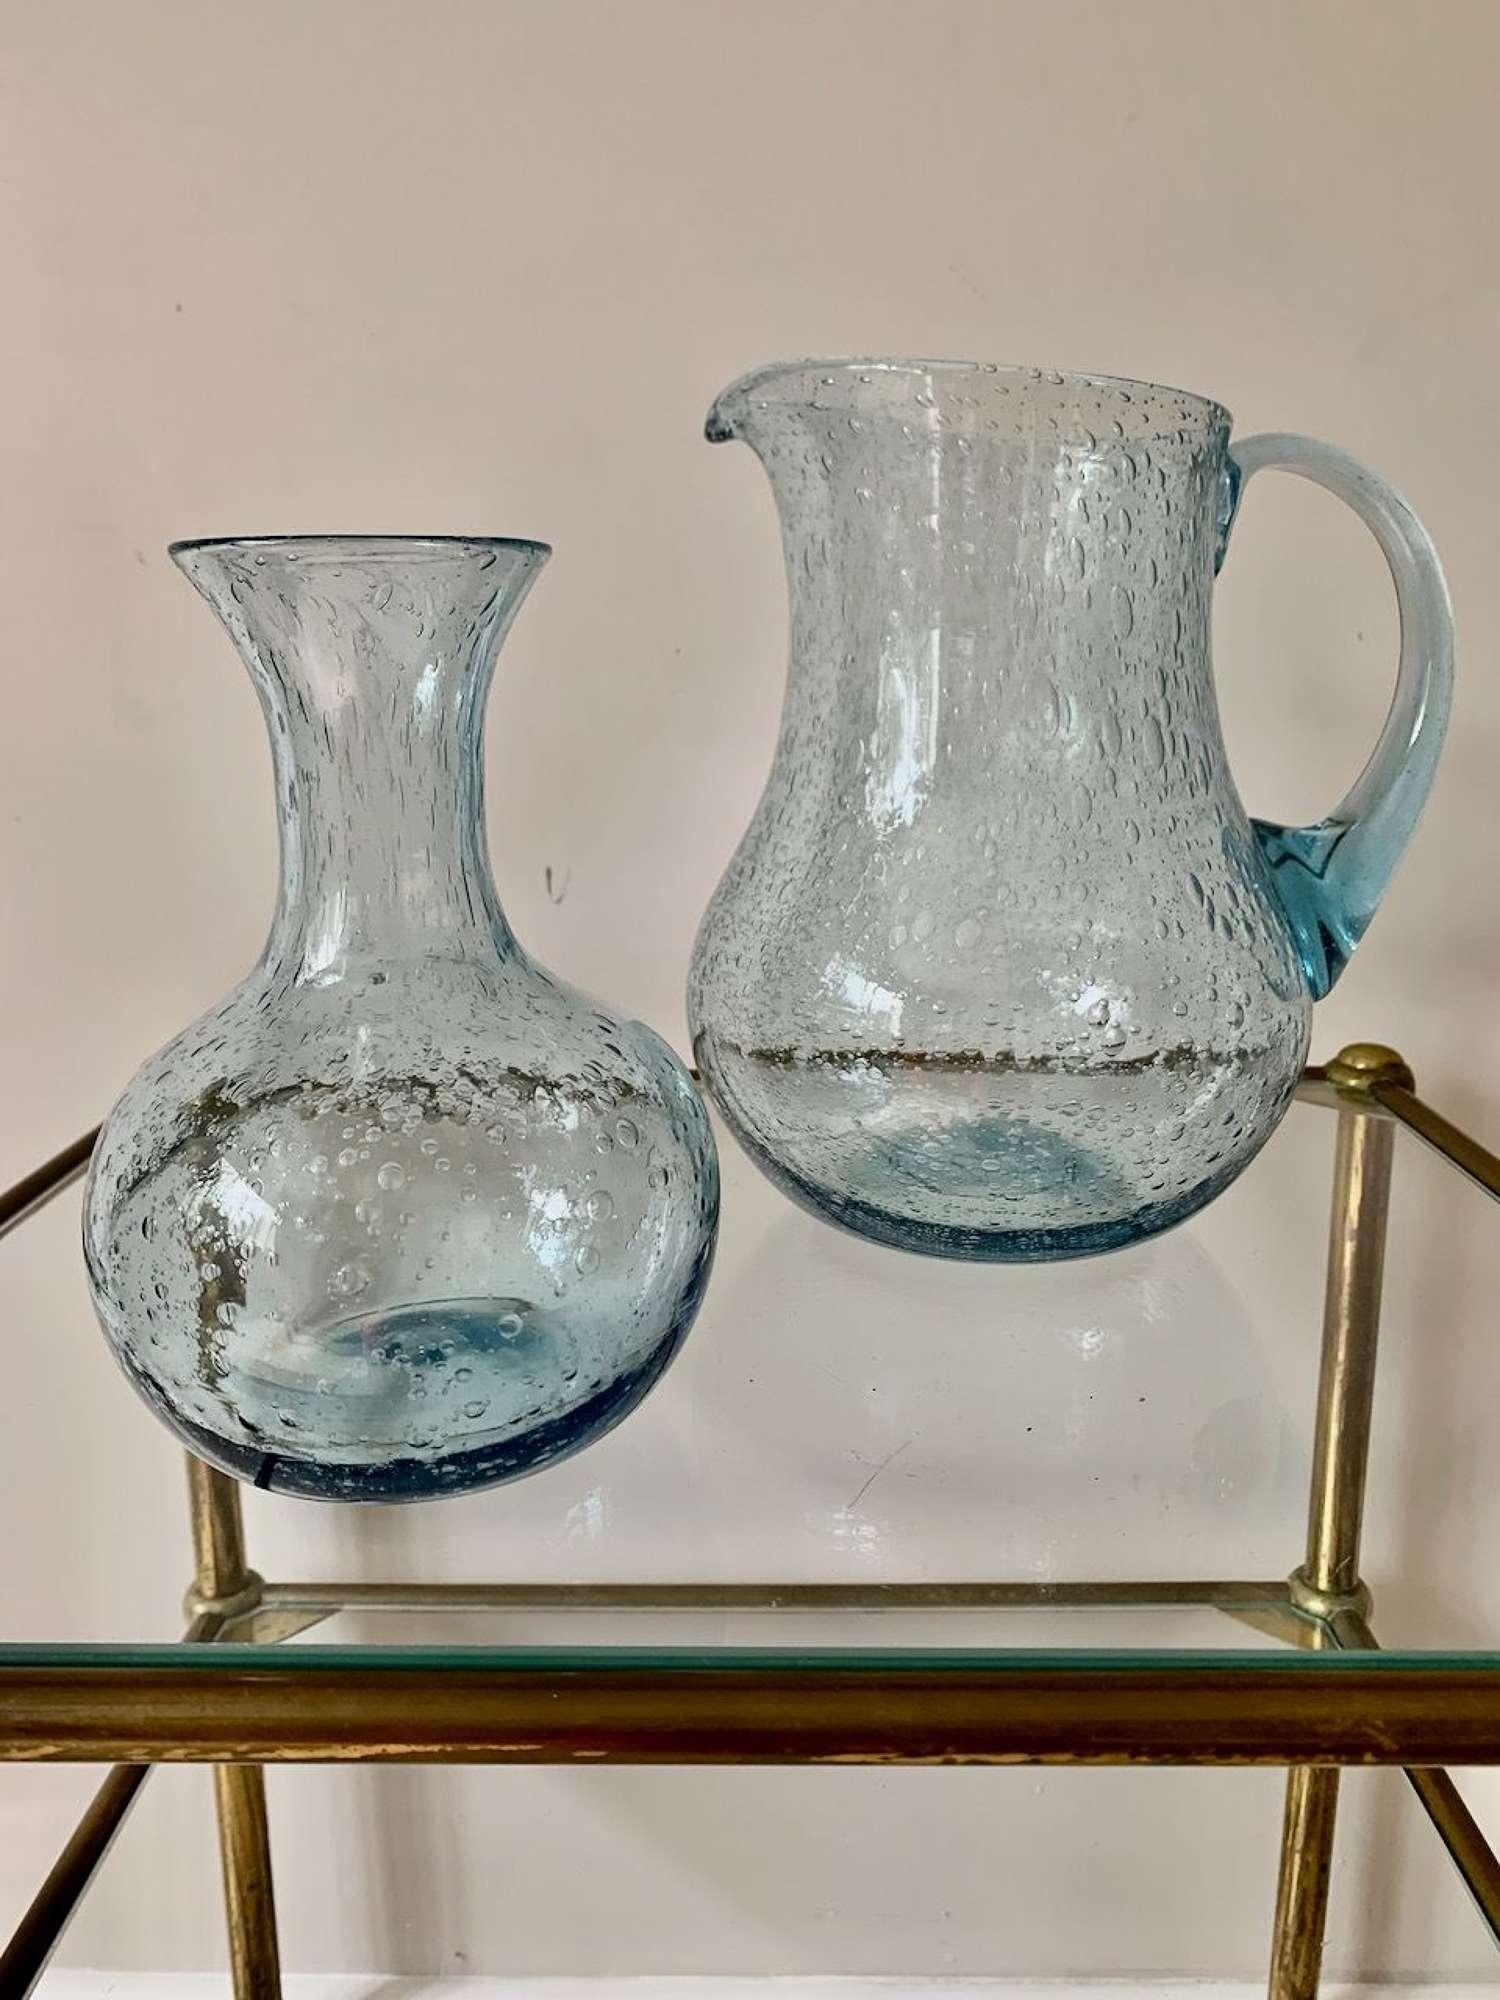 Blue bubble jug by Biot